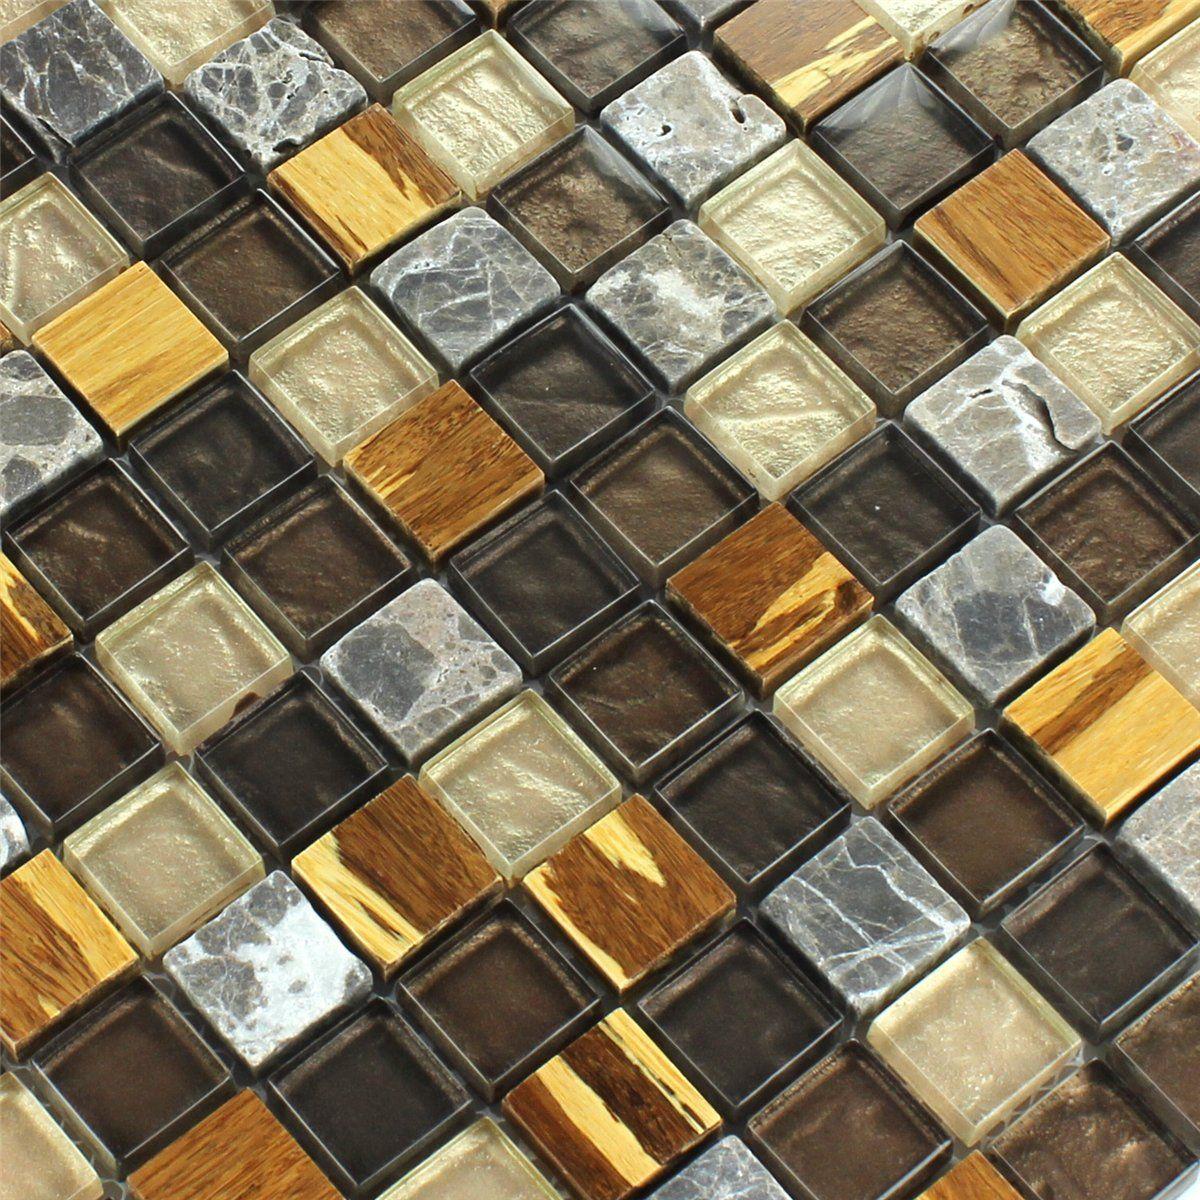 bambus naturfaser marmor glas mosaik fliesen bunt mix - 1 matte